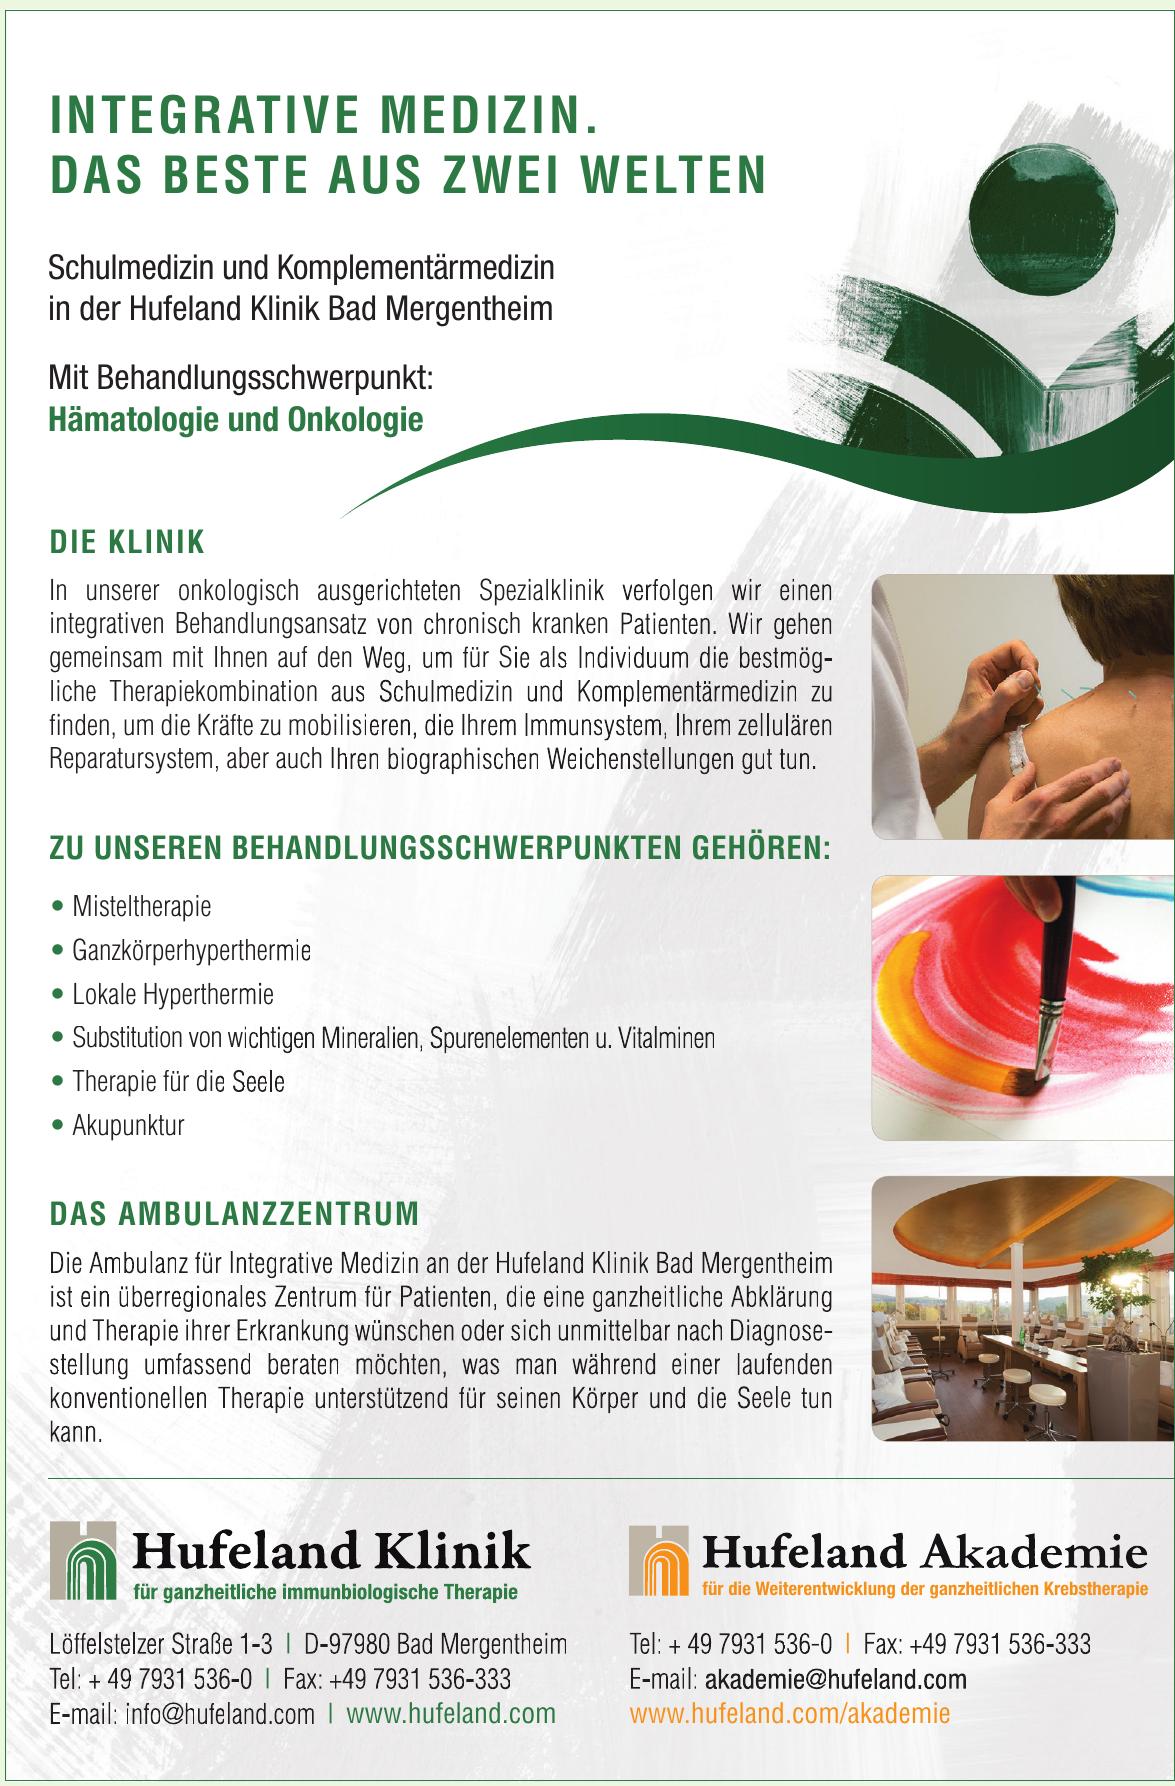 Hufenland Klinik